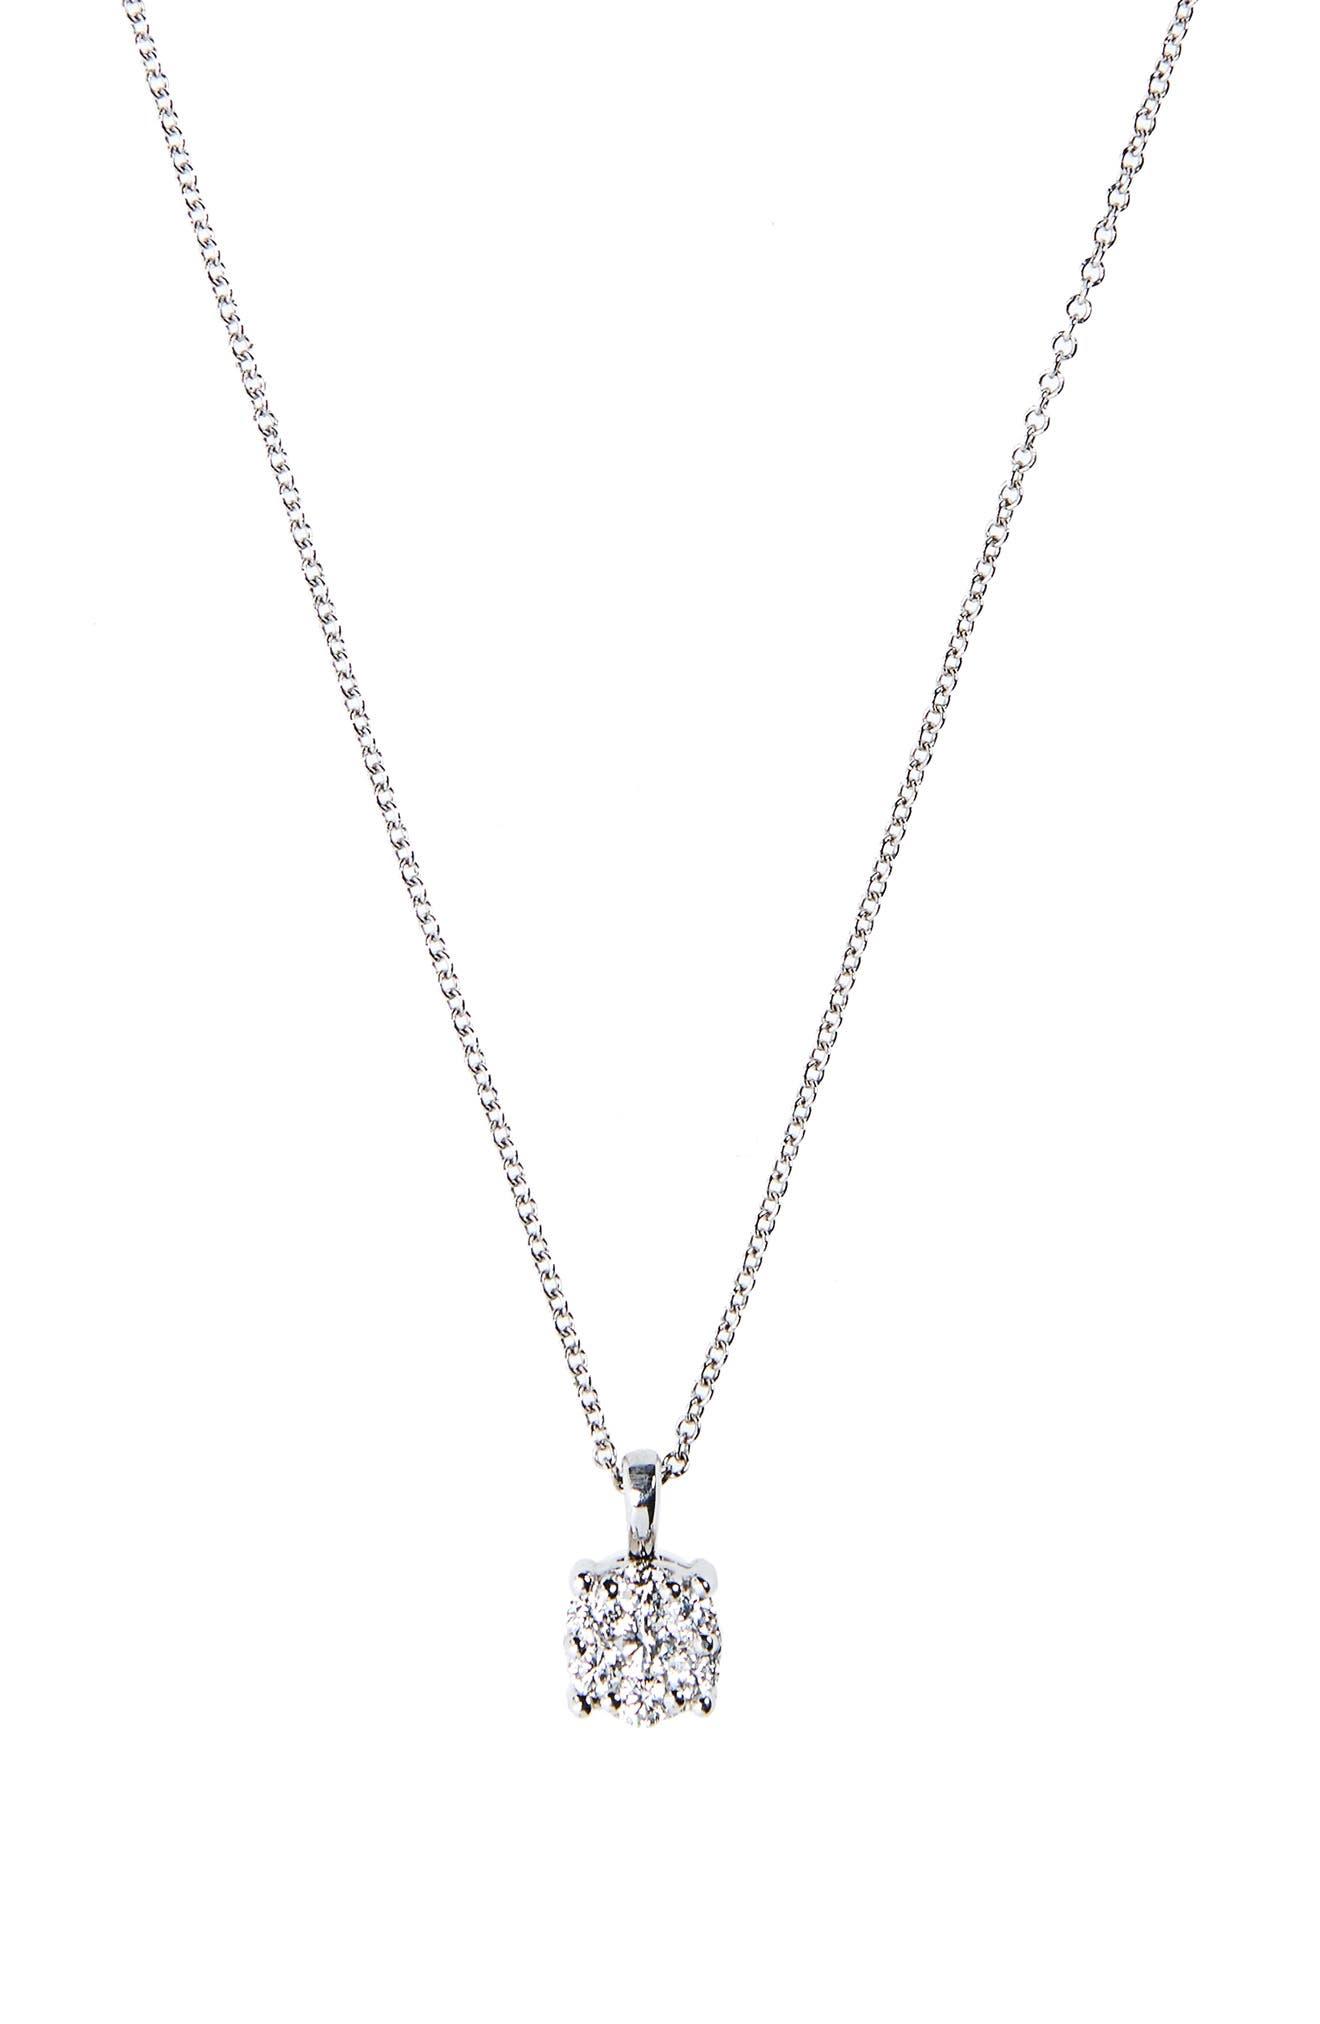 Lucky 7 Diamond Pendant Necklace,                             Alternate thumbnail 2, color,                             711